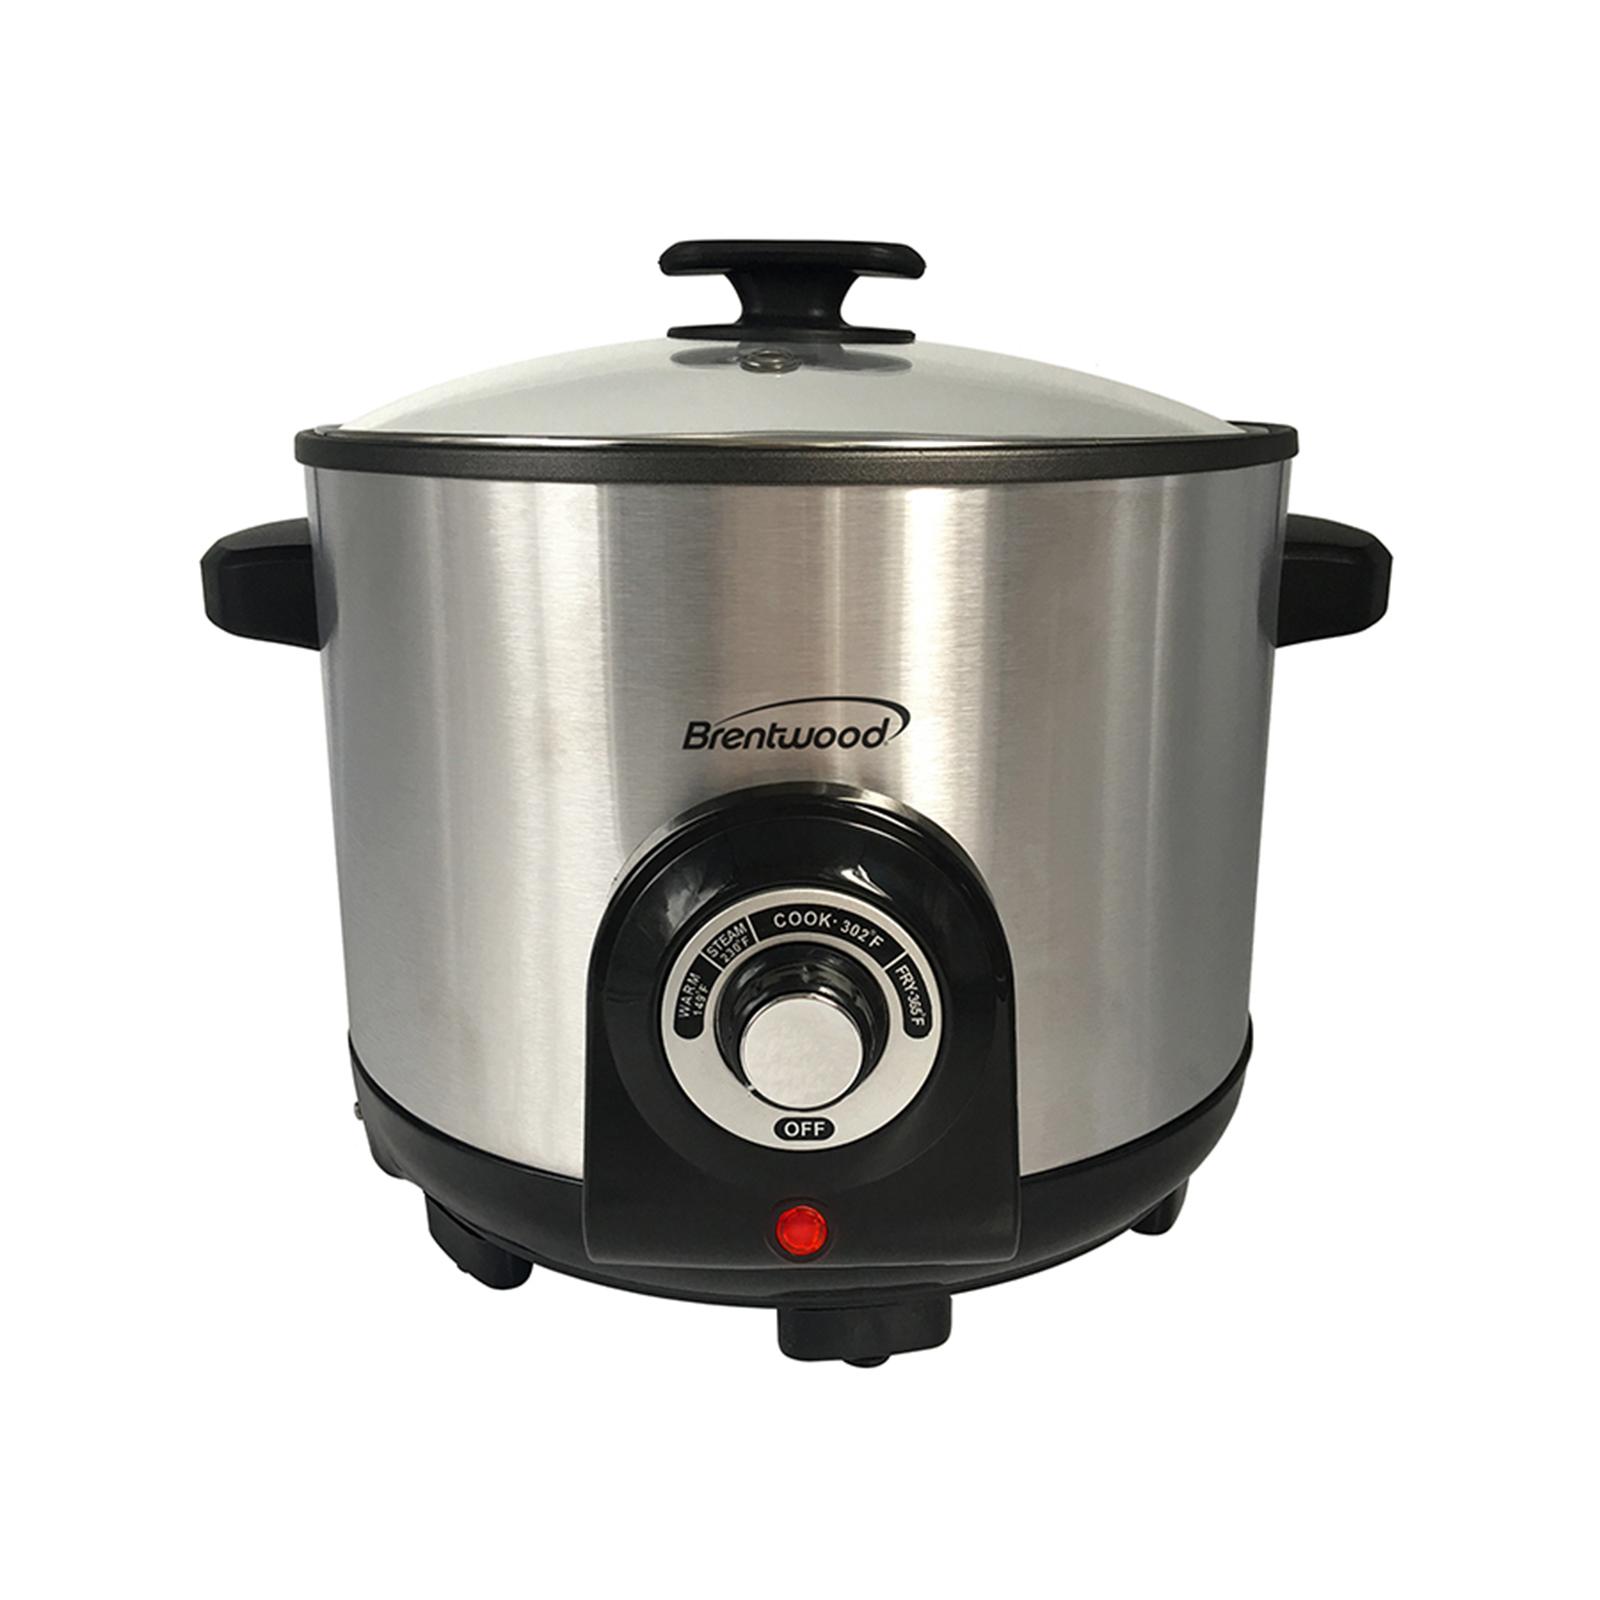 Image of Brentwood 970109862M 5.2 Quart Deep Fryer, Metallic silver